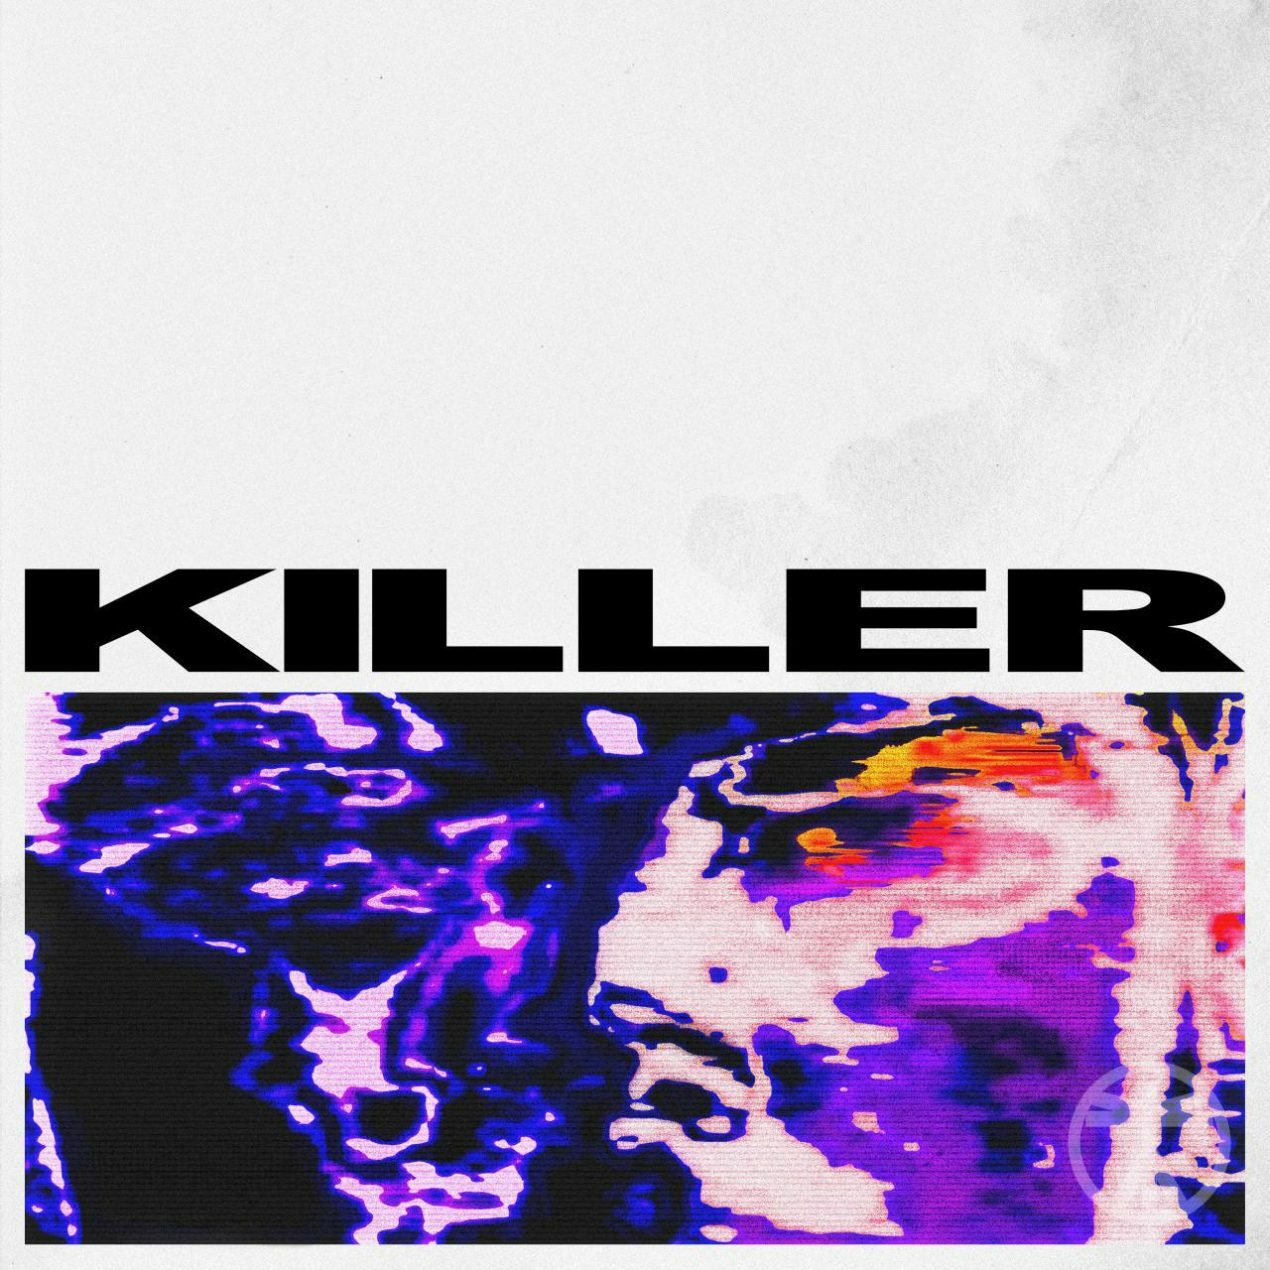 Boys Noize ft. Steven A Clark – Killer (Remixes) (Boys Noize Records)